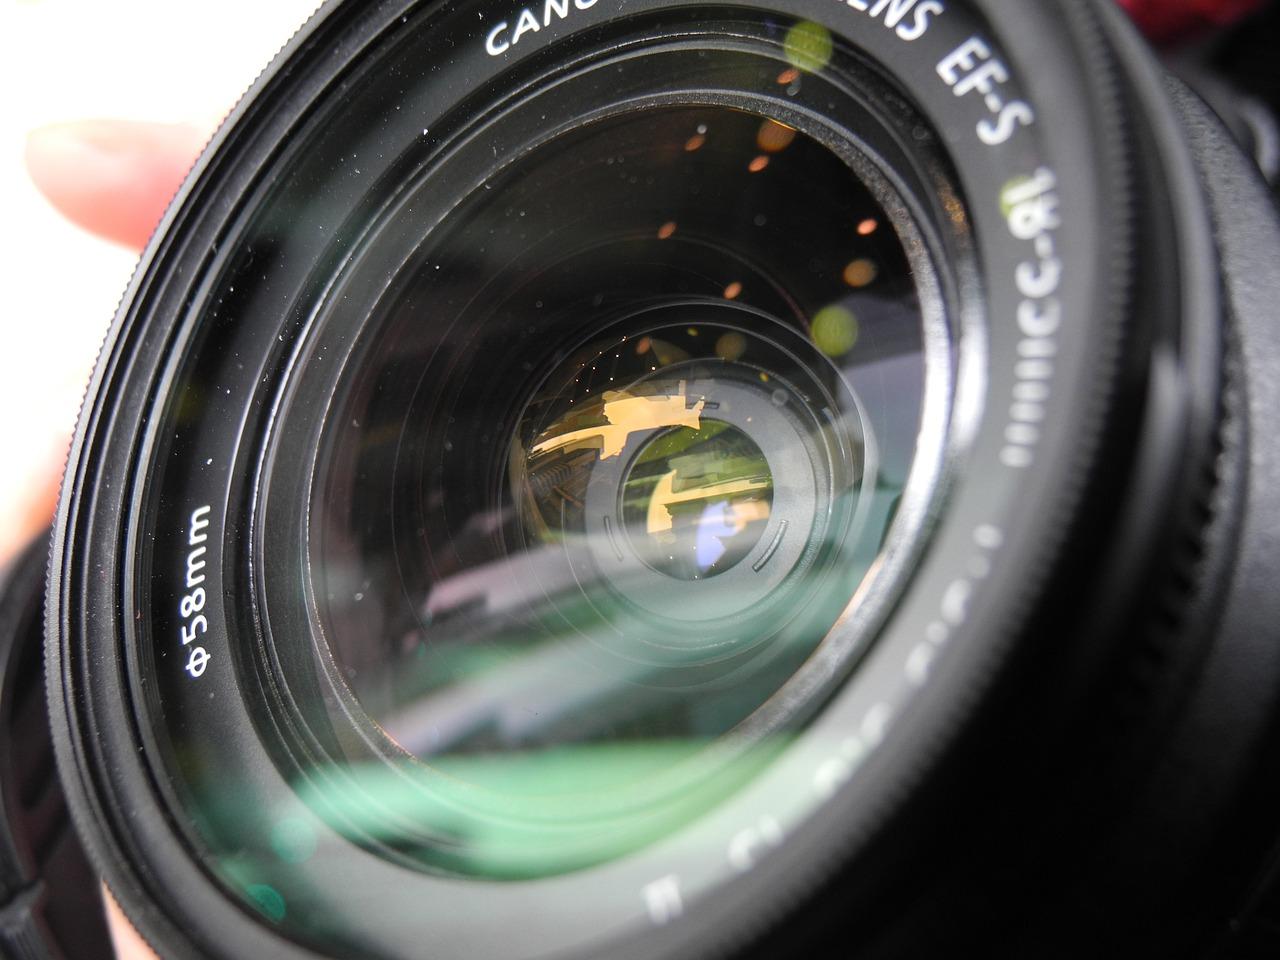 запотевает объектив фотоаппарата предмет гардероба